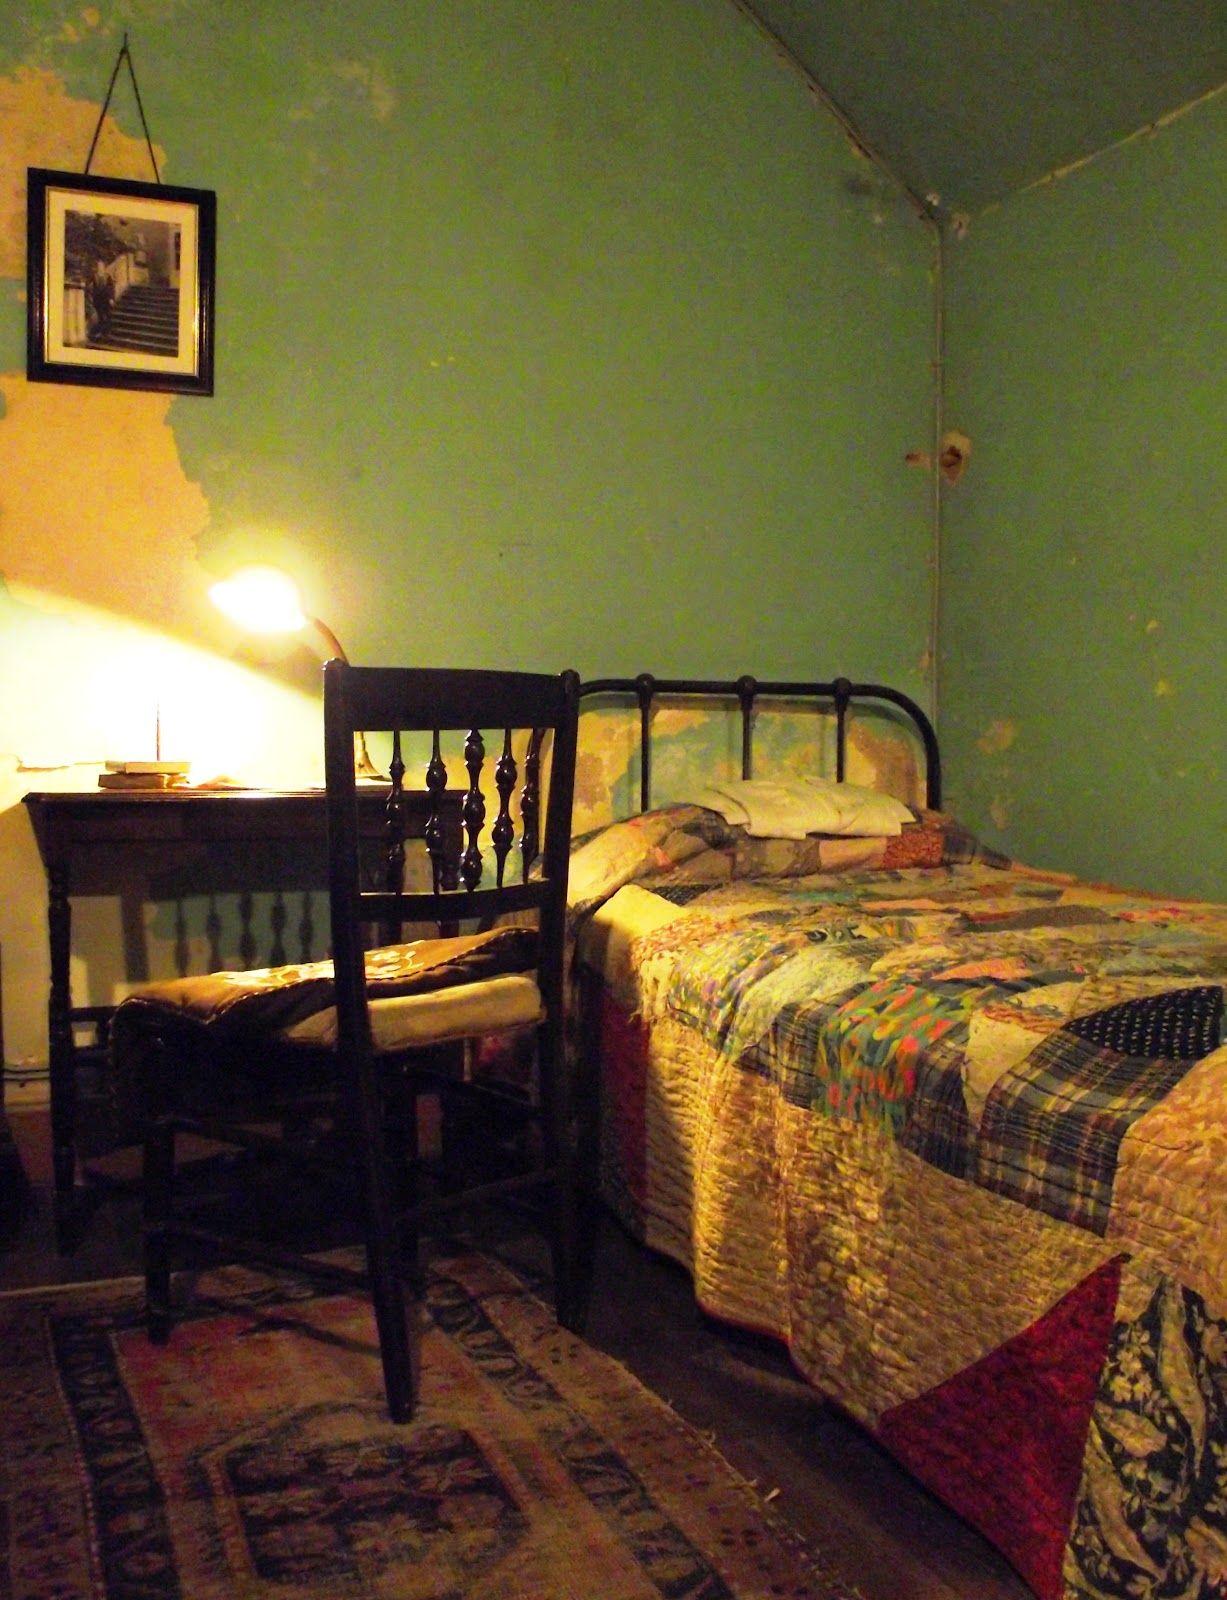 berrington hall servants quarters simplify bedroom 1920s rh pinterest com 1920s themed bedroom 1920s bedroom furniture styles